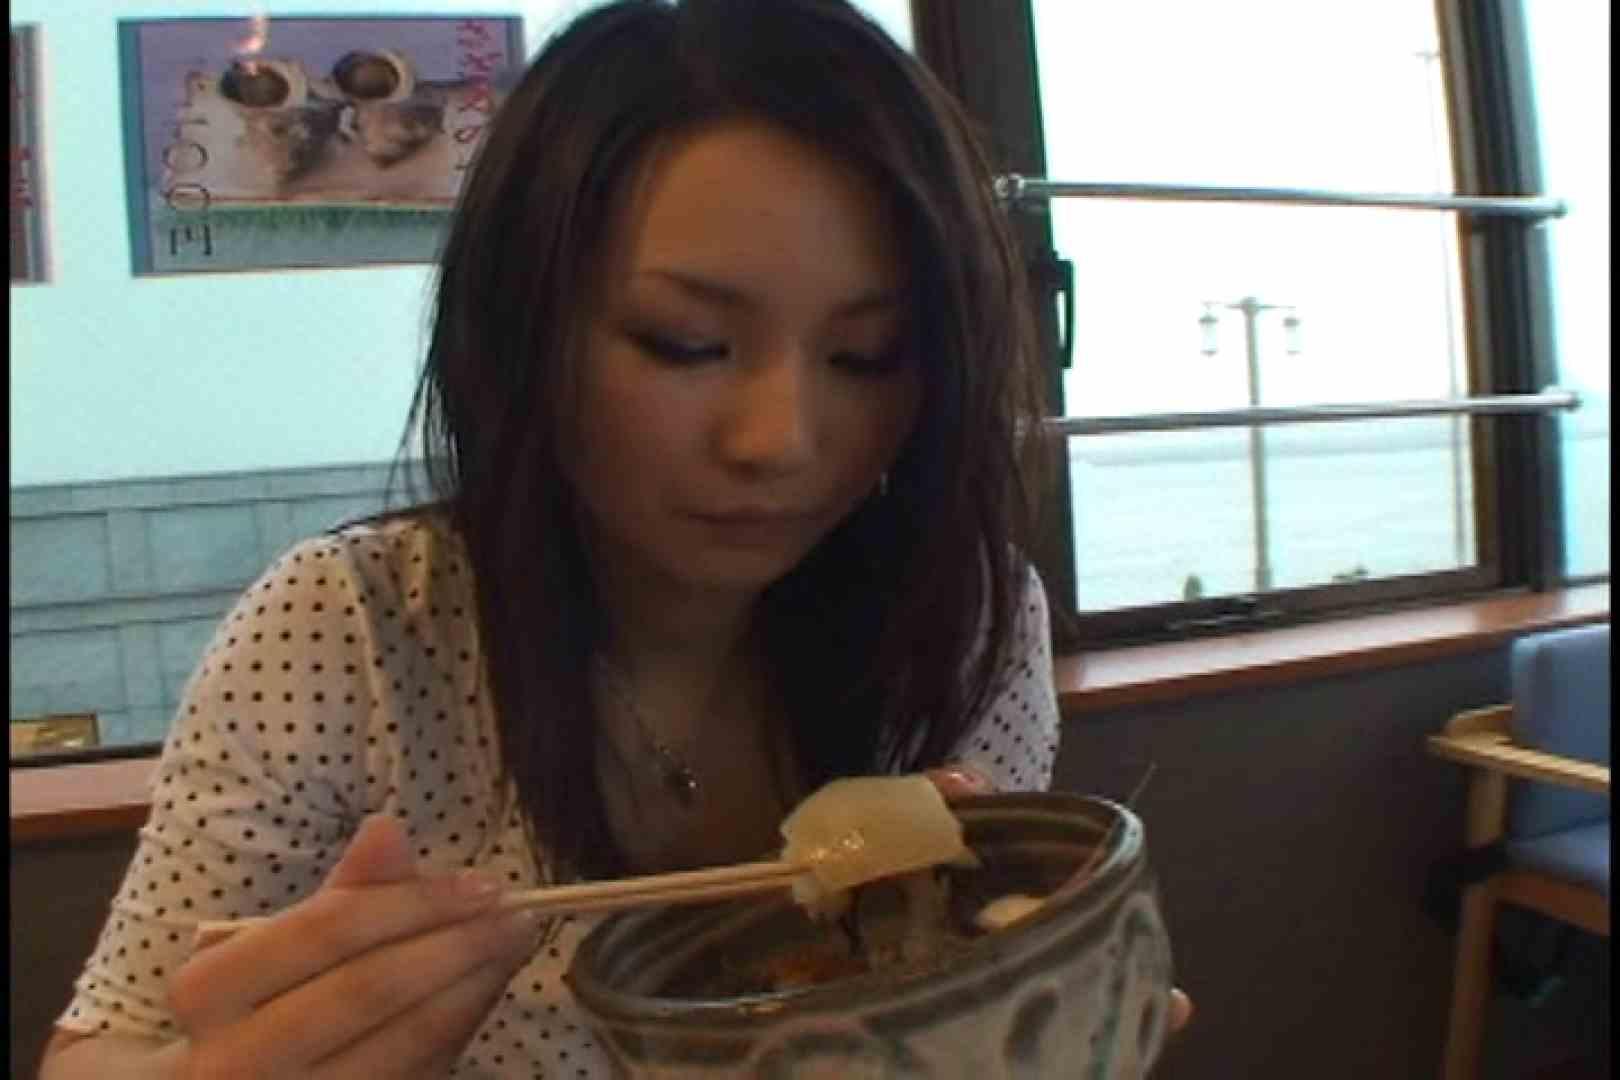 JDハンター全国ツアー vol.045 前編 女子大生丸裸  84pic 28